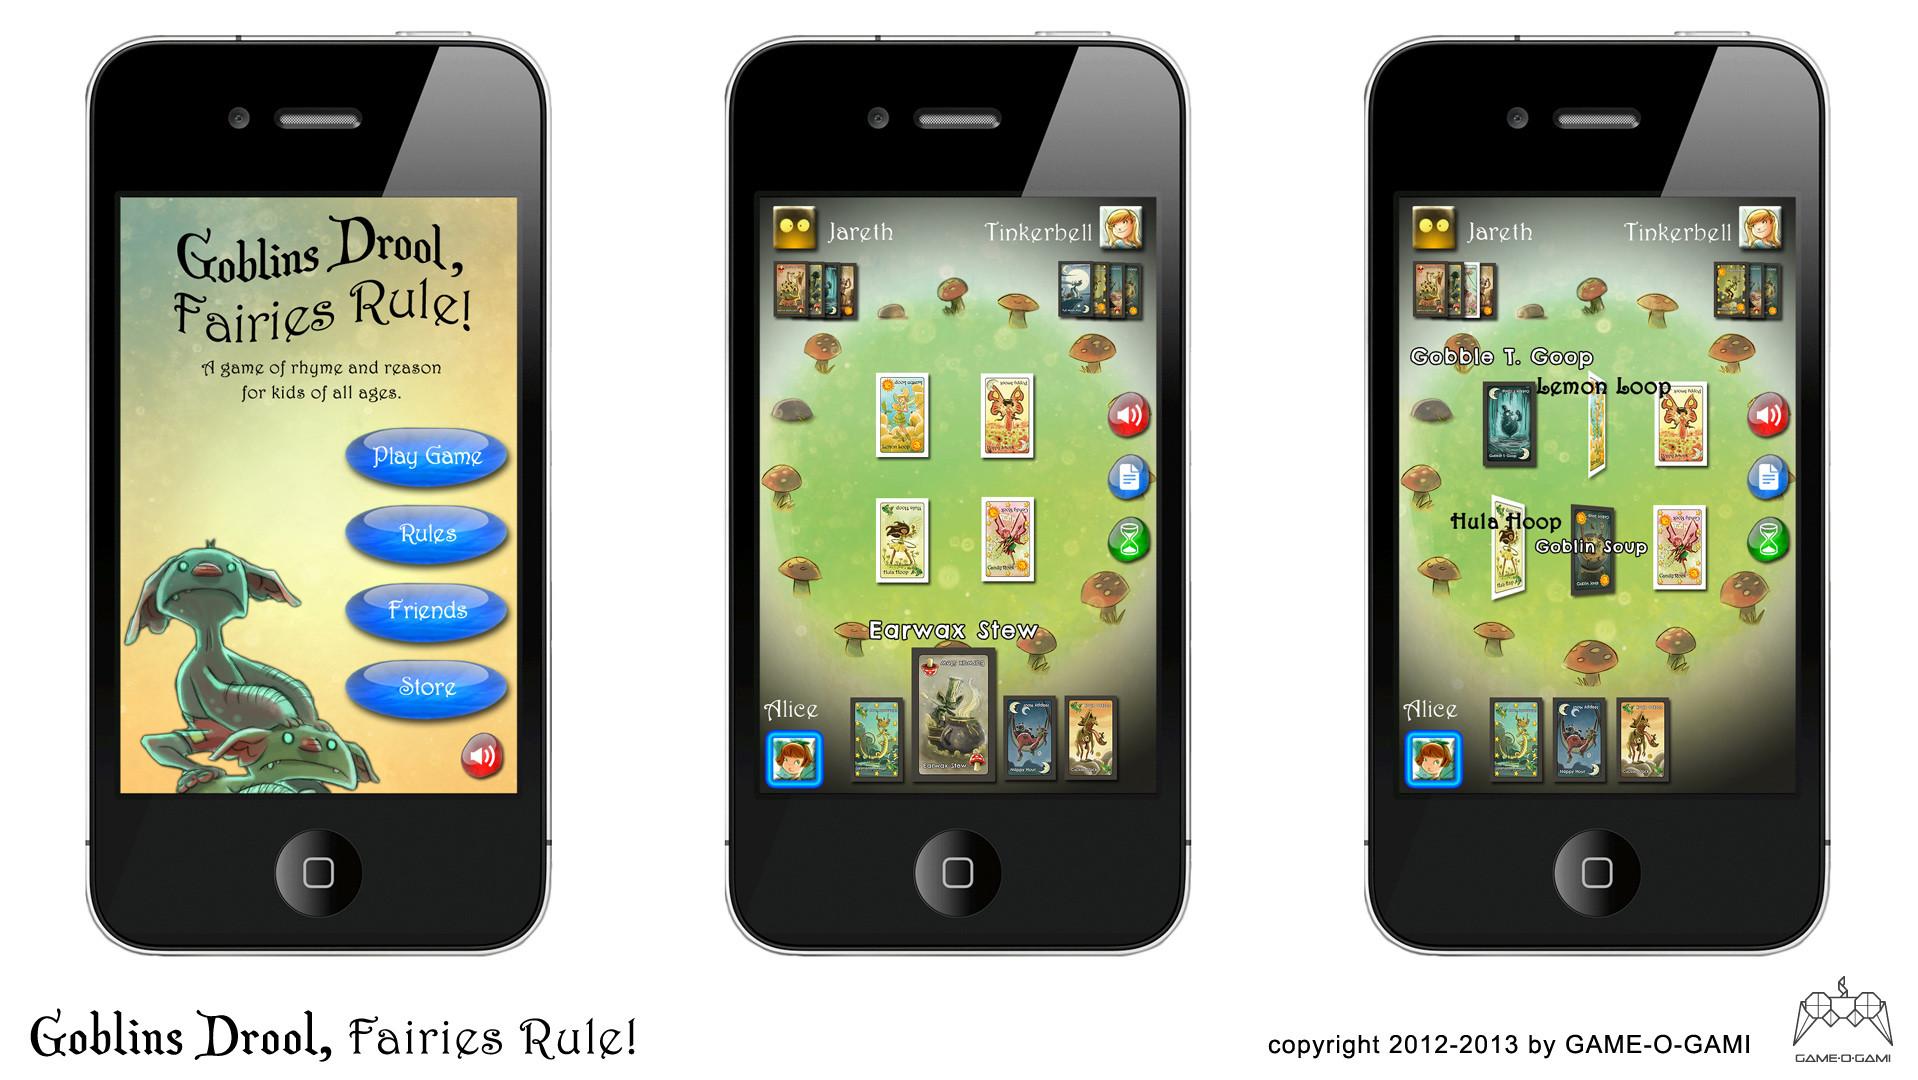 David sanhueza gdfr iphone slide 01